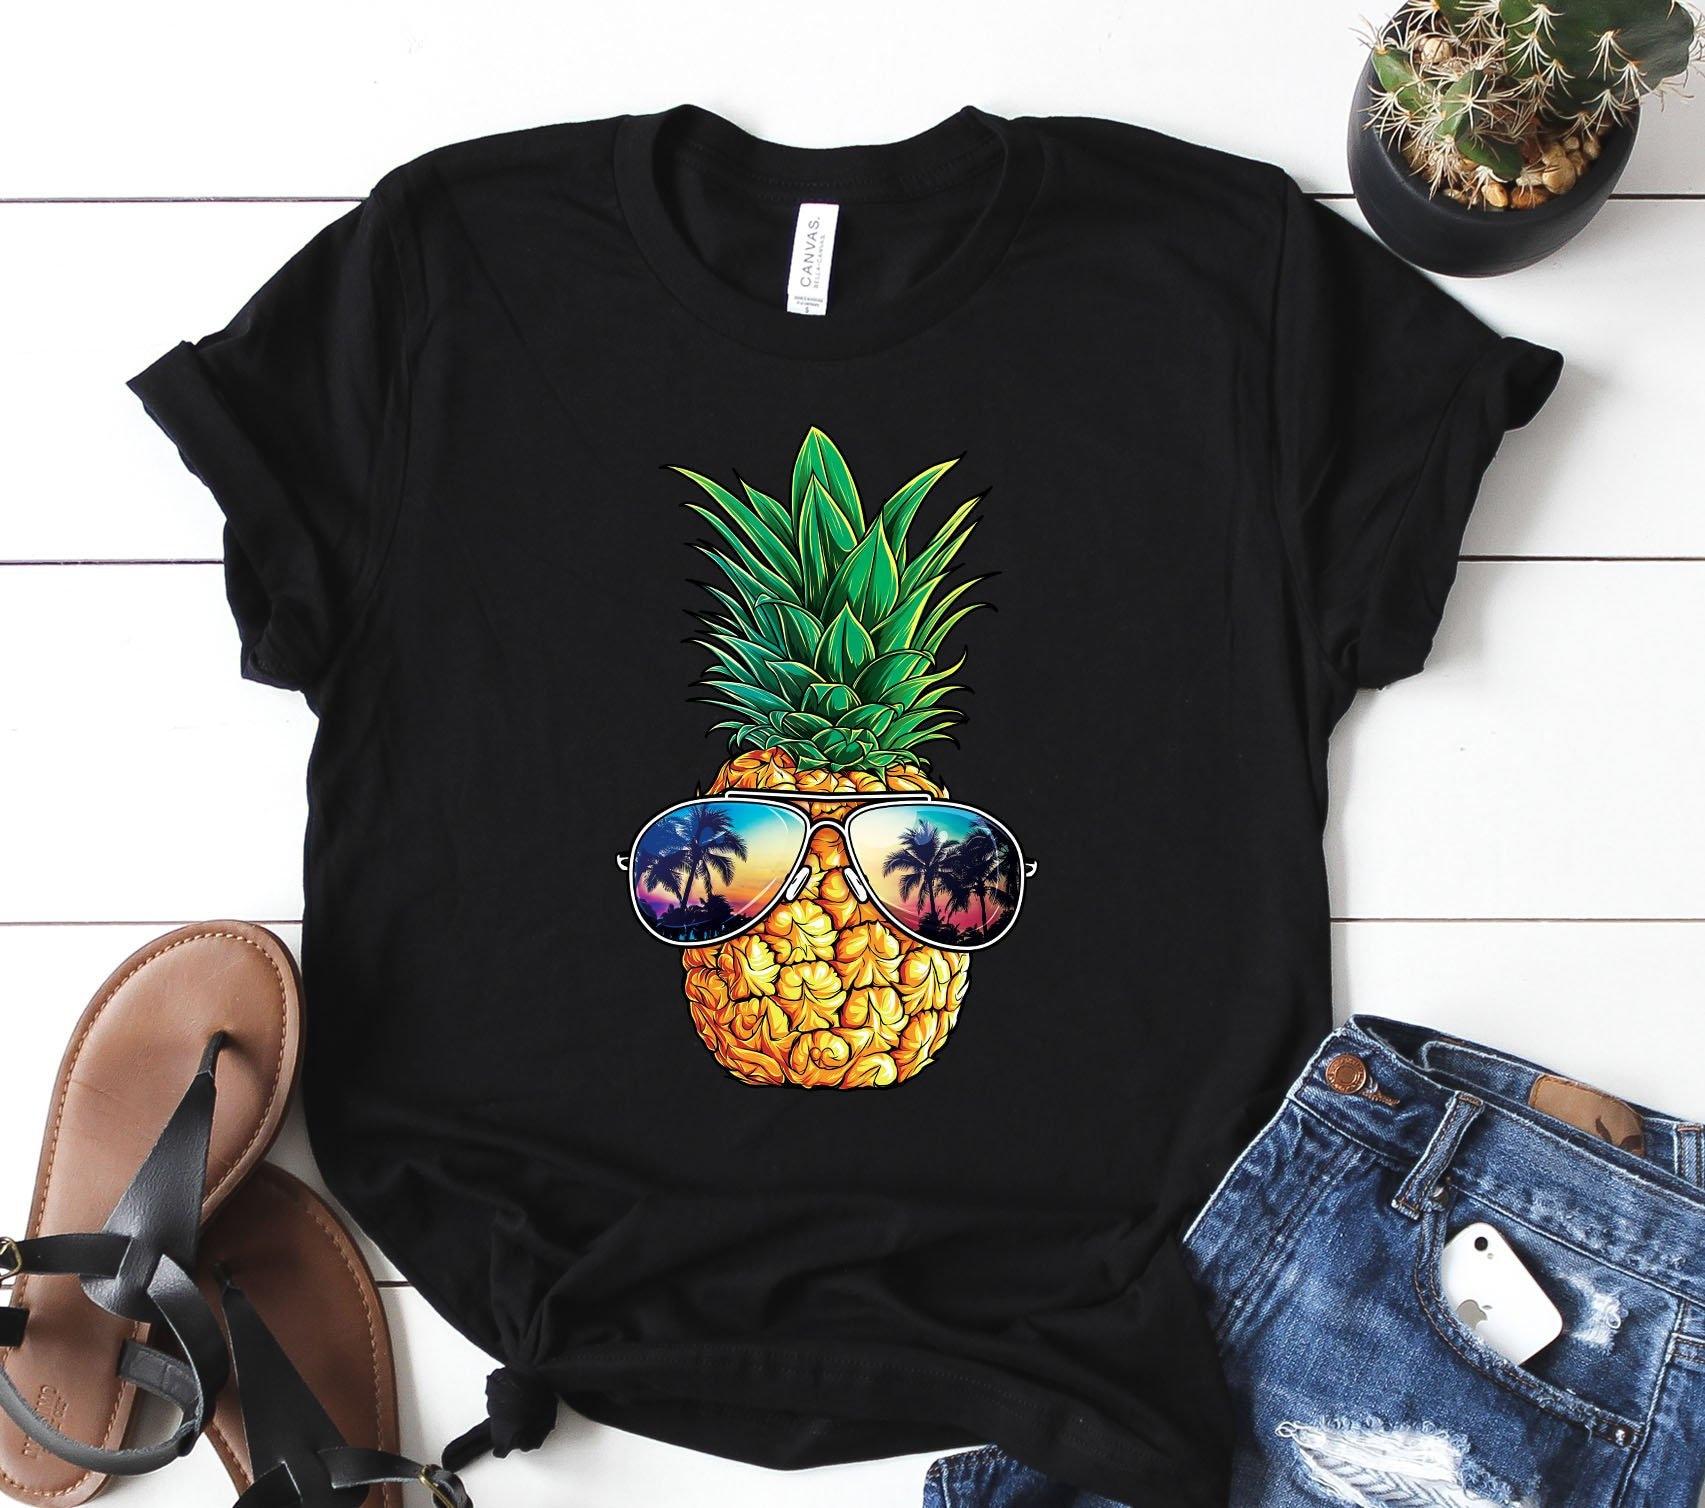 Ananas lunettes de soleil T hommes shirt garçons filles hommes T femmes enfants Aloha plages hawaïenne Tee / Mens Tank / nageur / sweat / Hoodie 019537